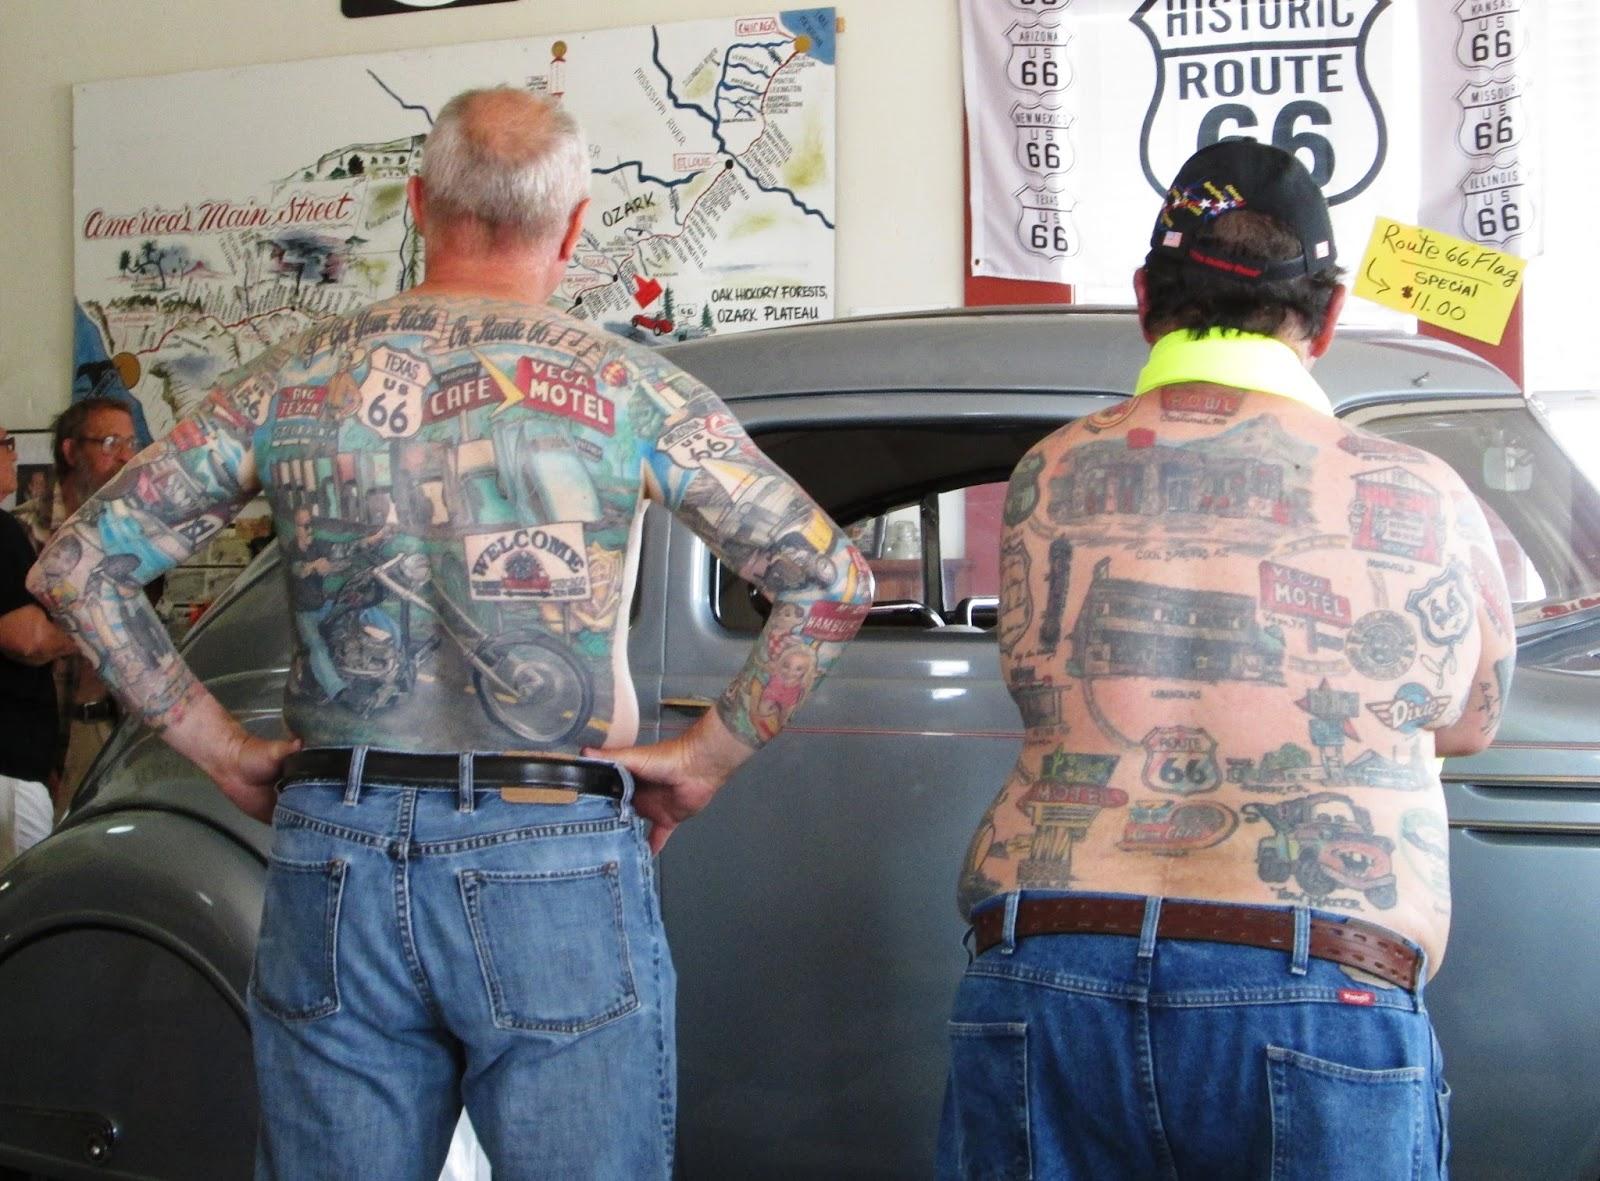 the gallery for peterbilt truck tattoos. Black Bedroom Furniture Sets. Home Design Ideas